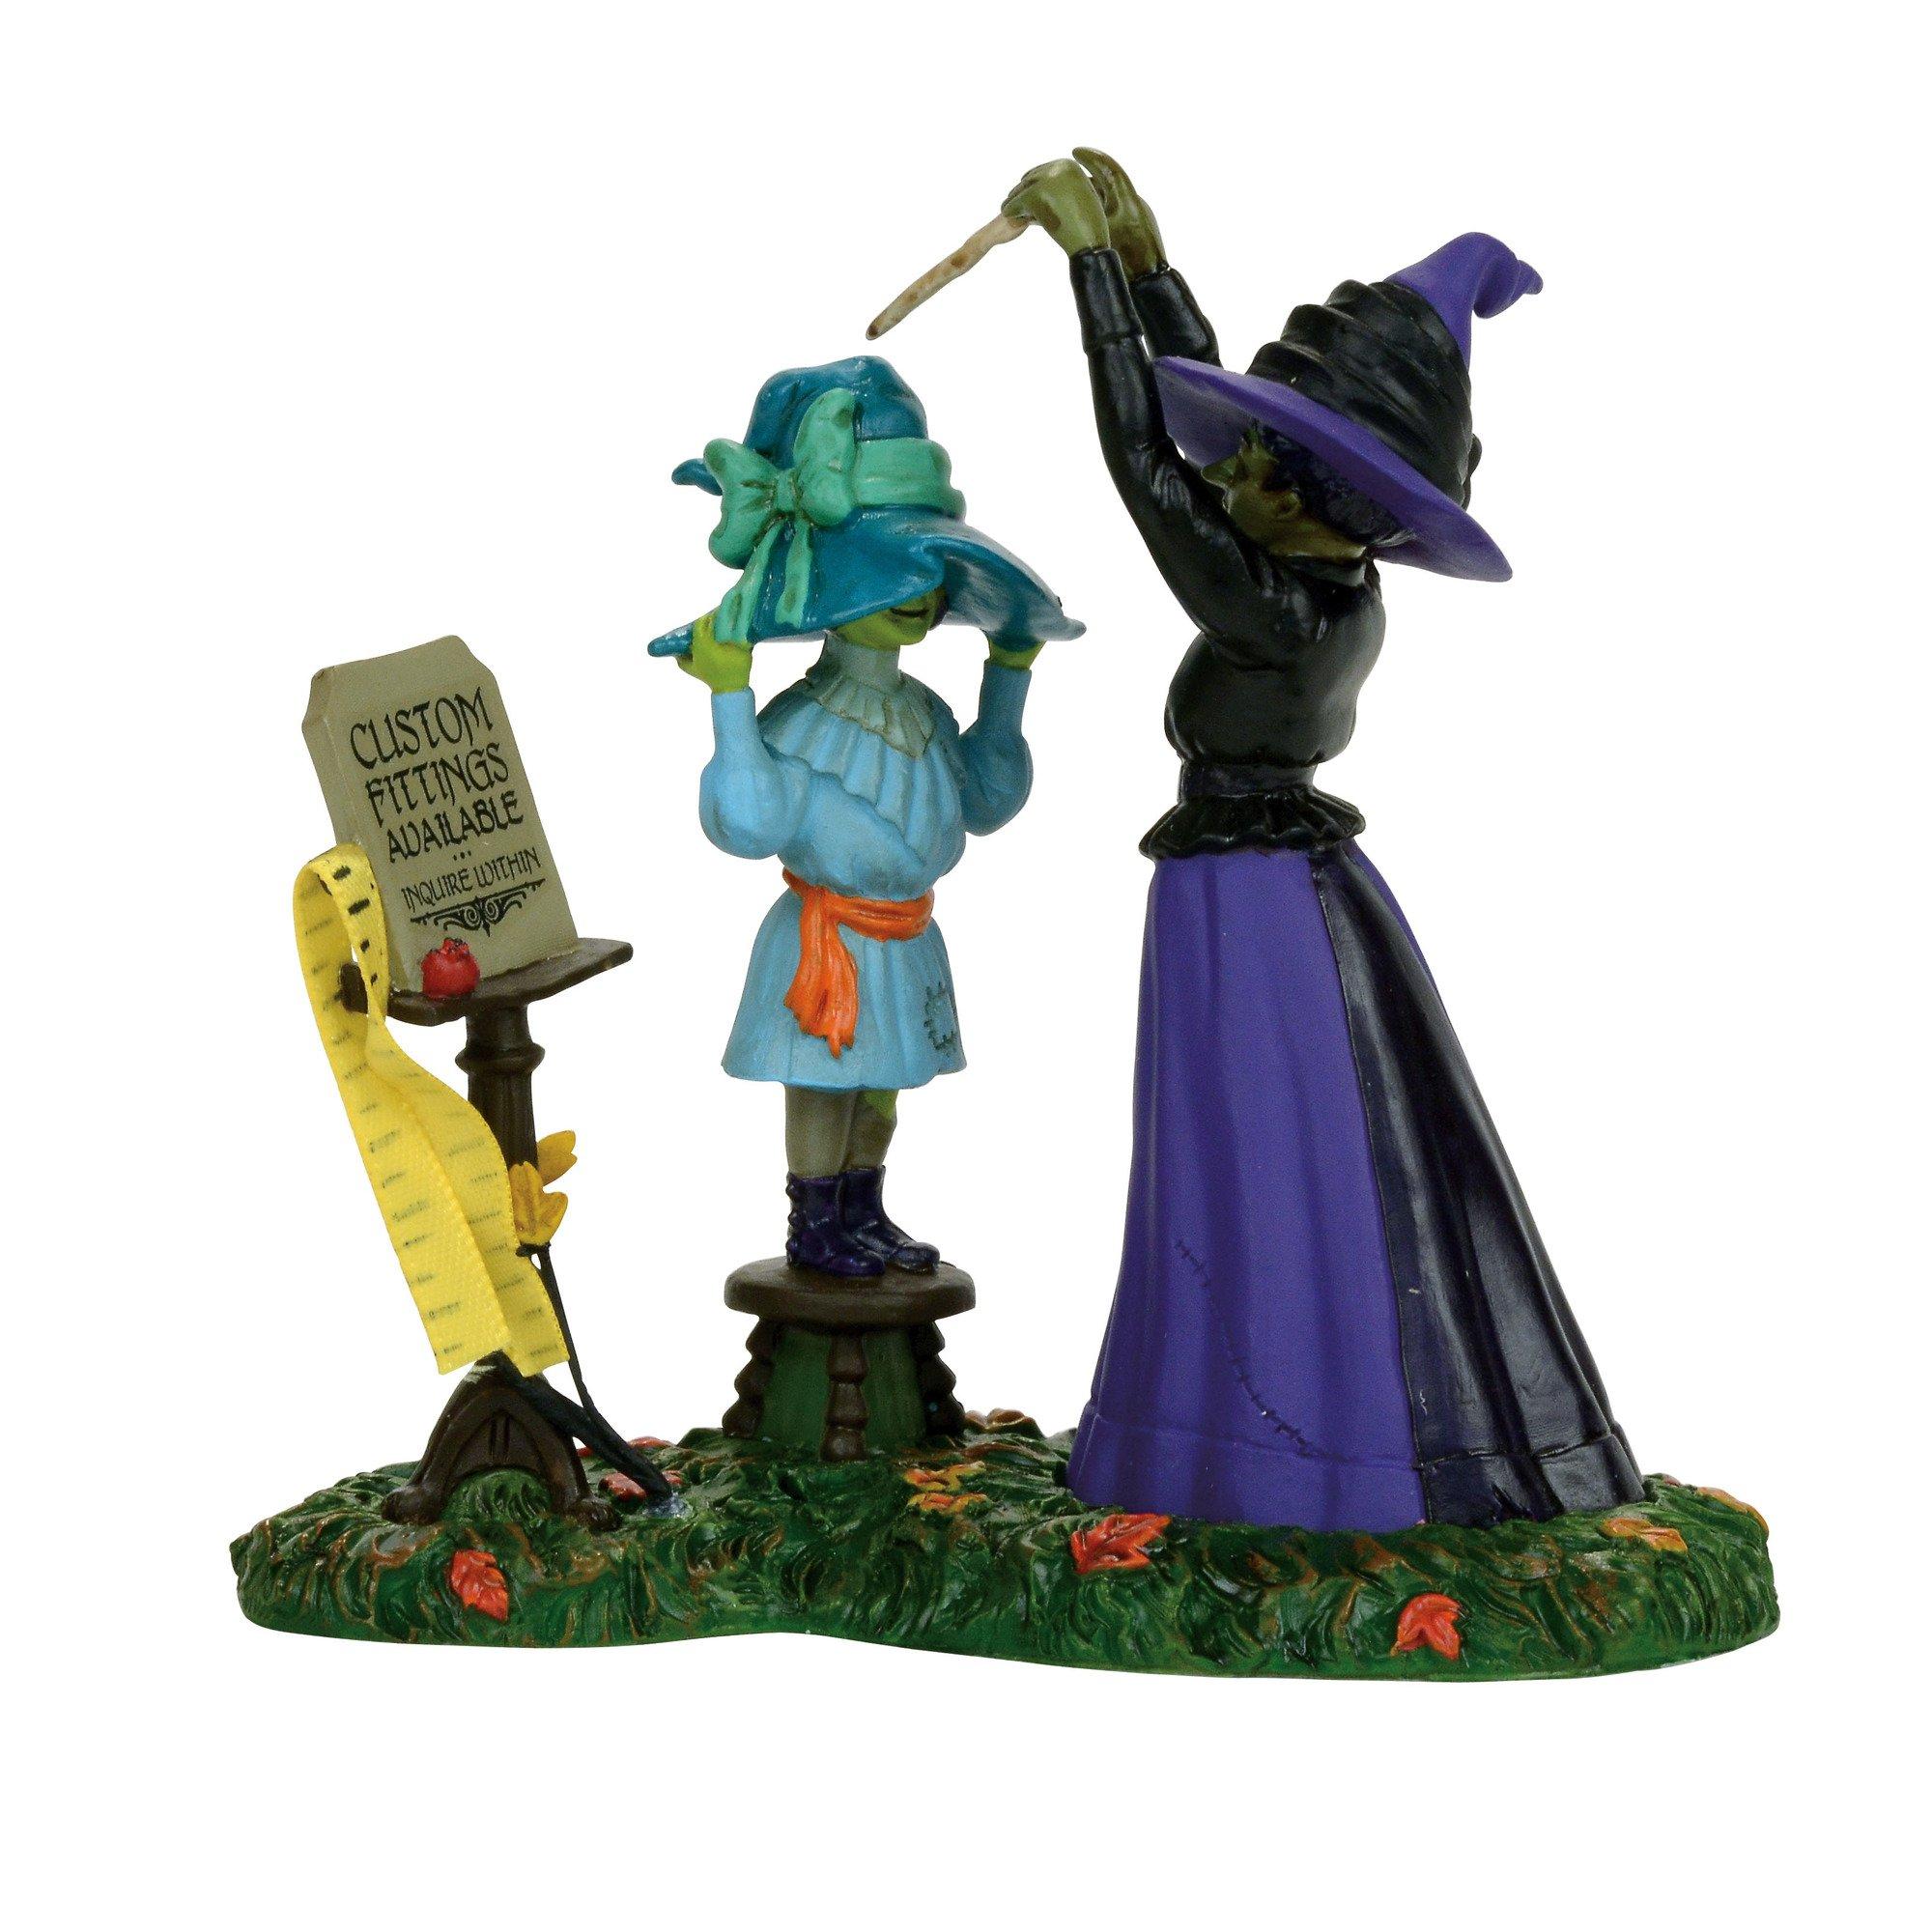 Department 56 Snow Village Halloween Hattie's Hats Custom Fitted Accessory Figurine